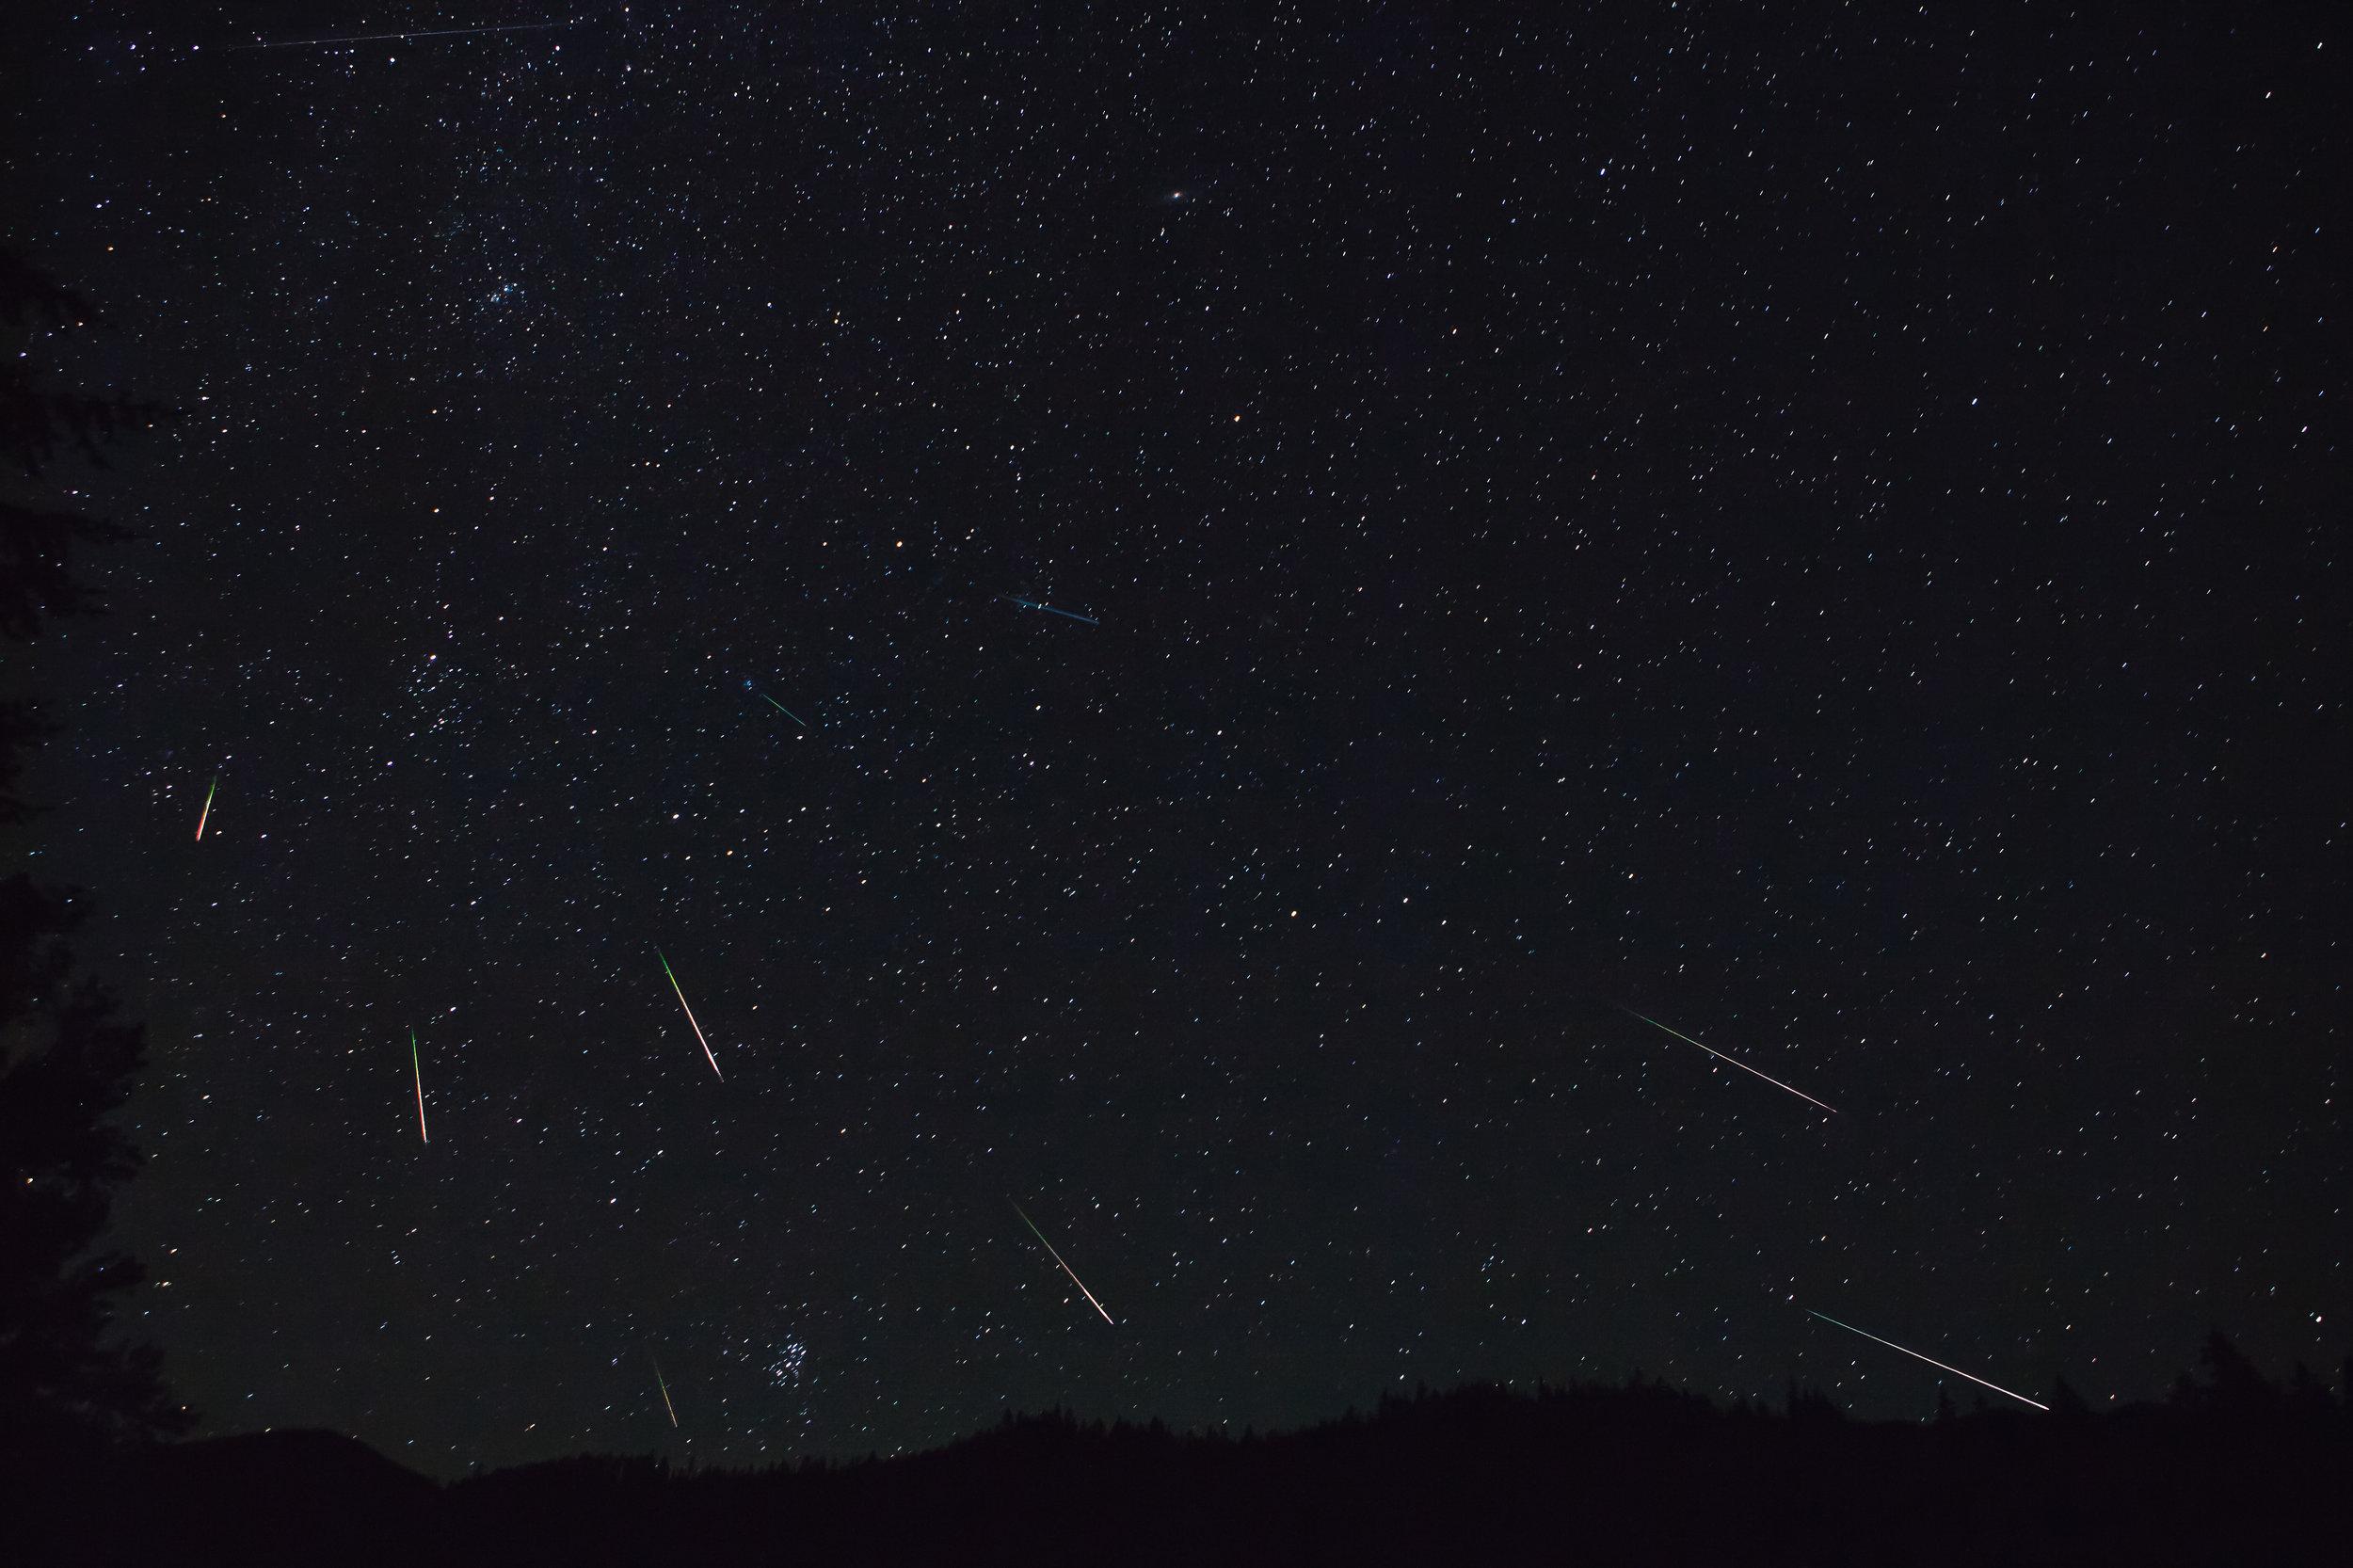 Perseid Meteor Shower, Okanogan-Wenatchee National Forest, Washington. Photo composite.